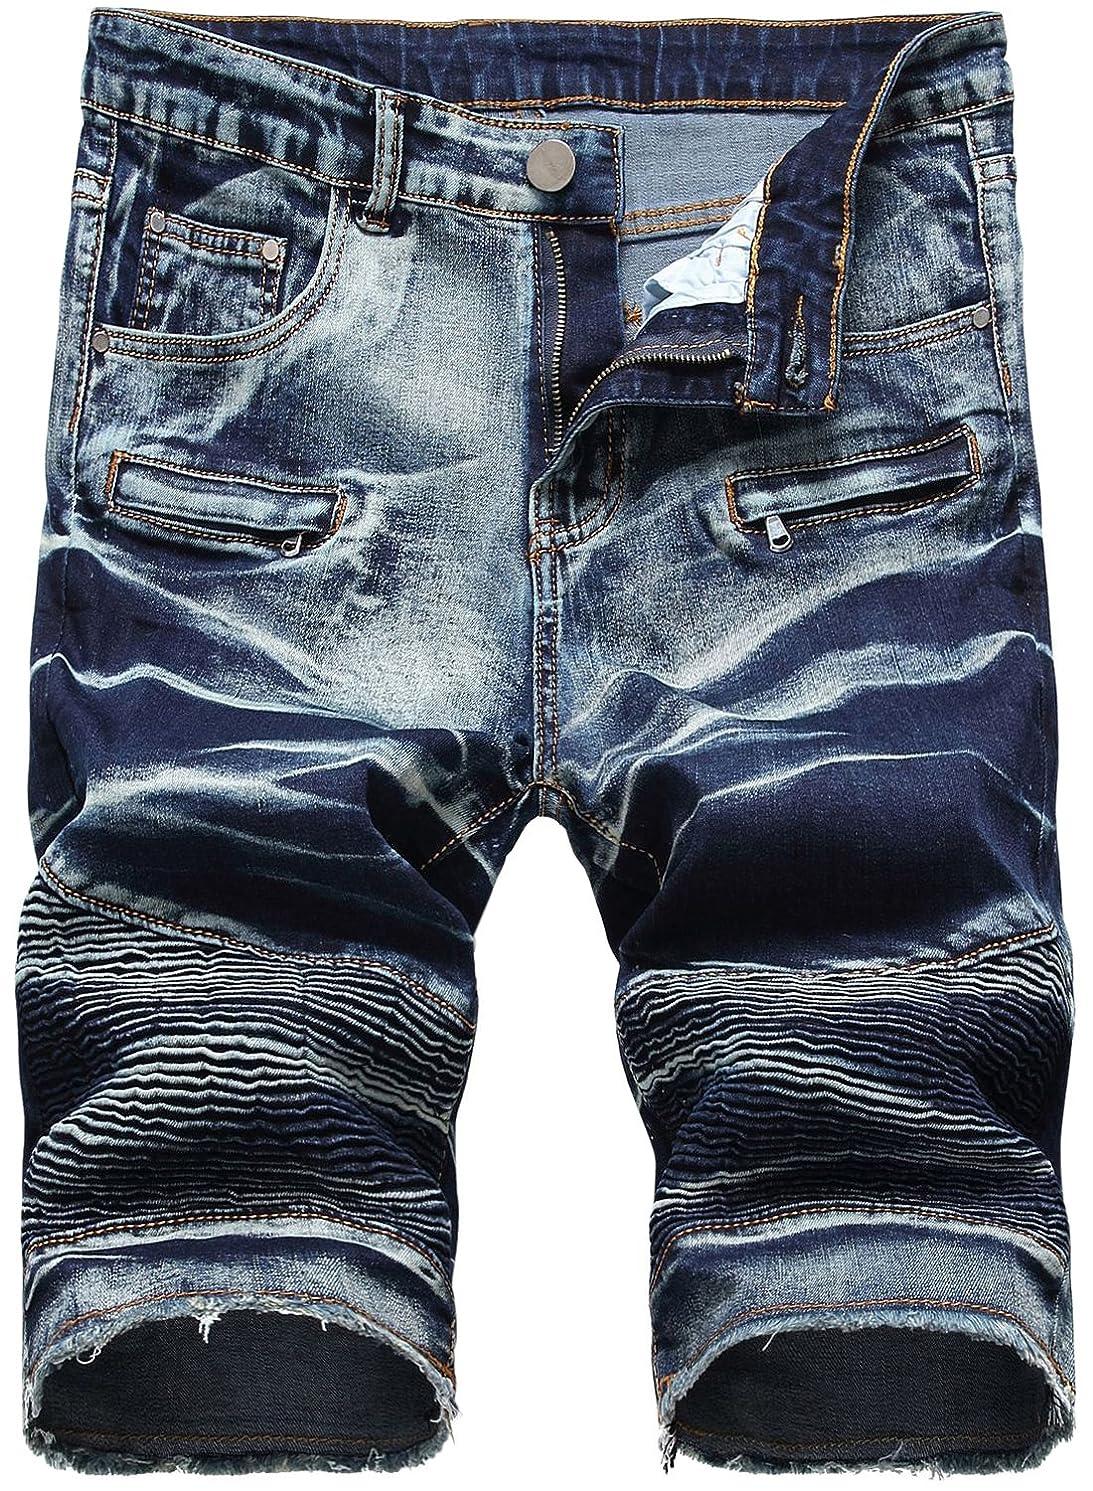 HENGAO Men's Denim Shorts with Zipper Deco